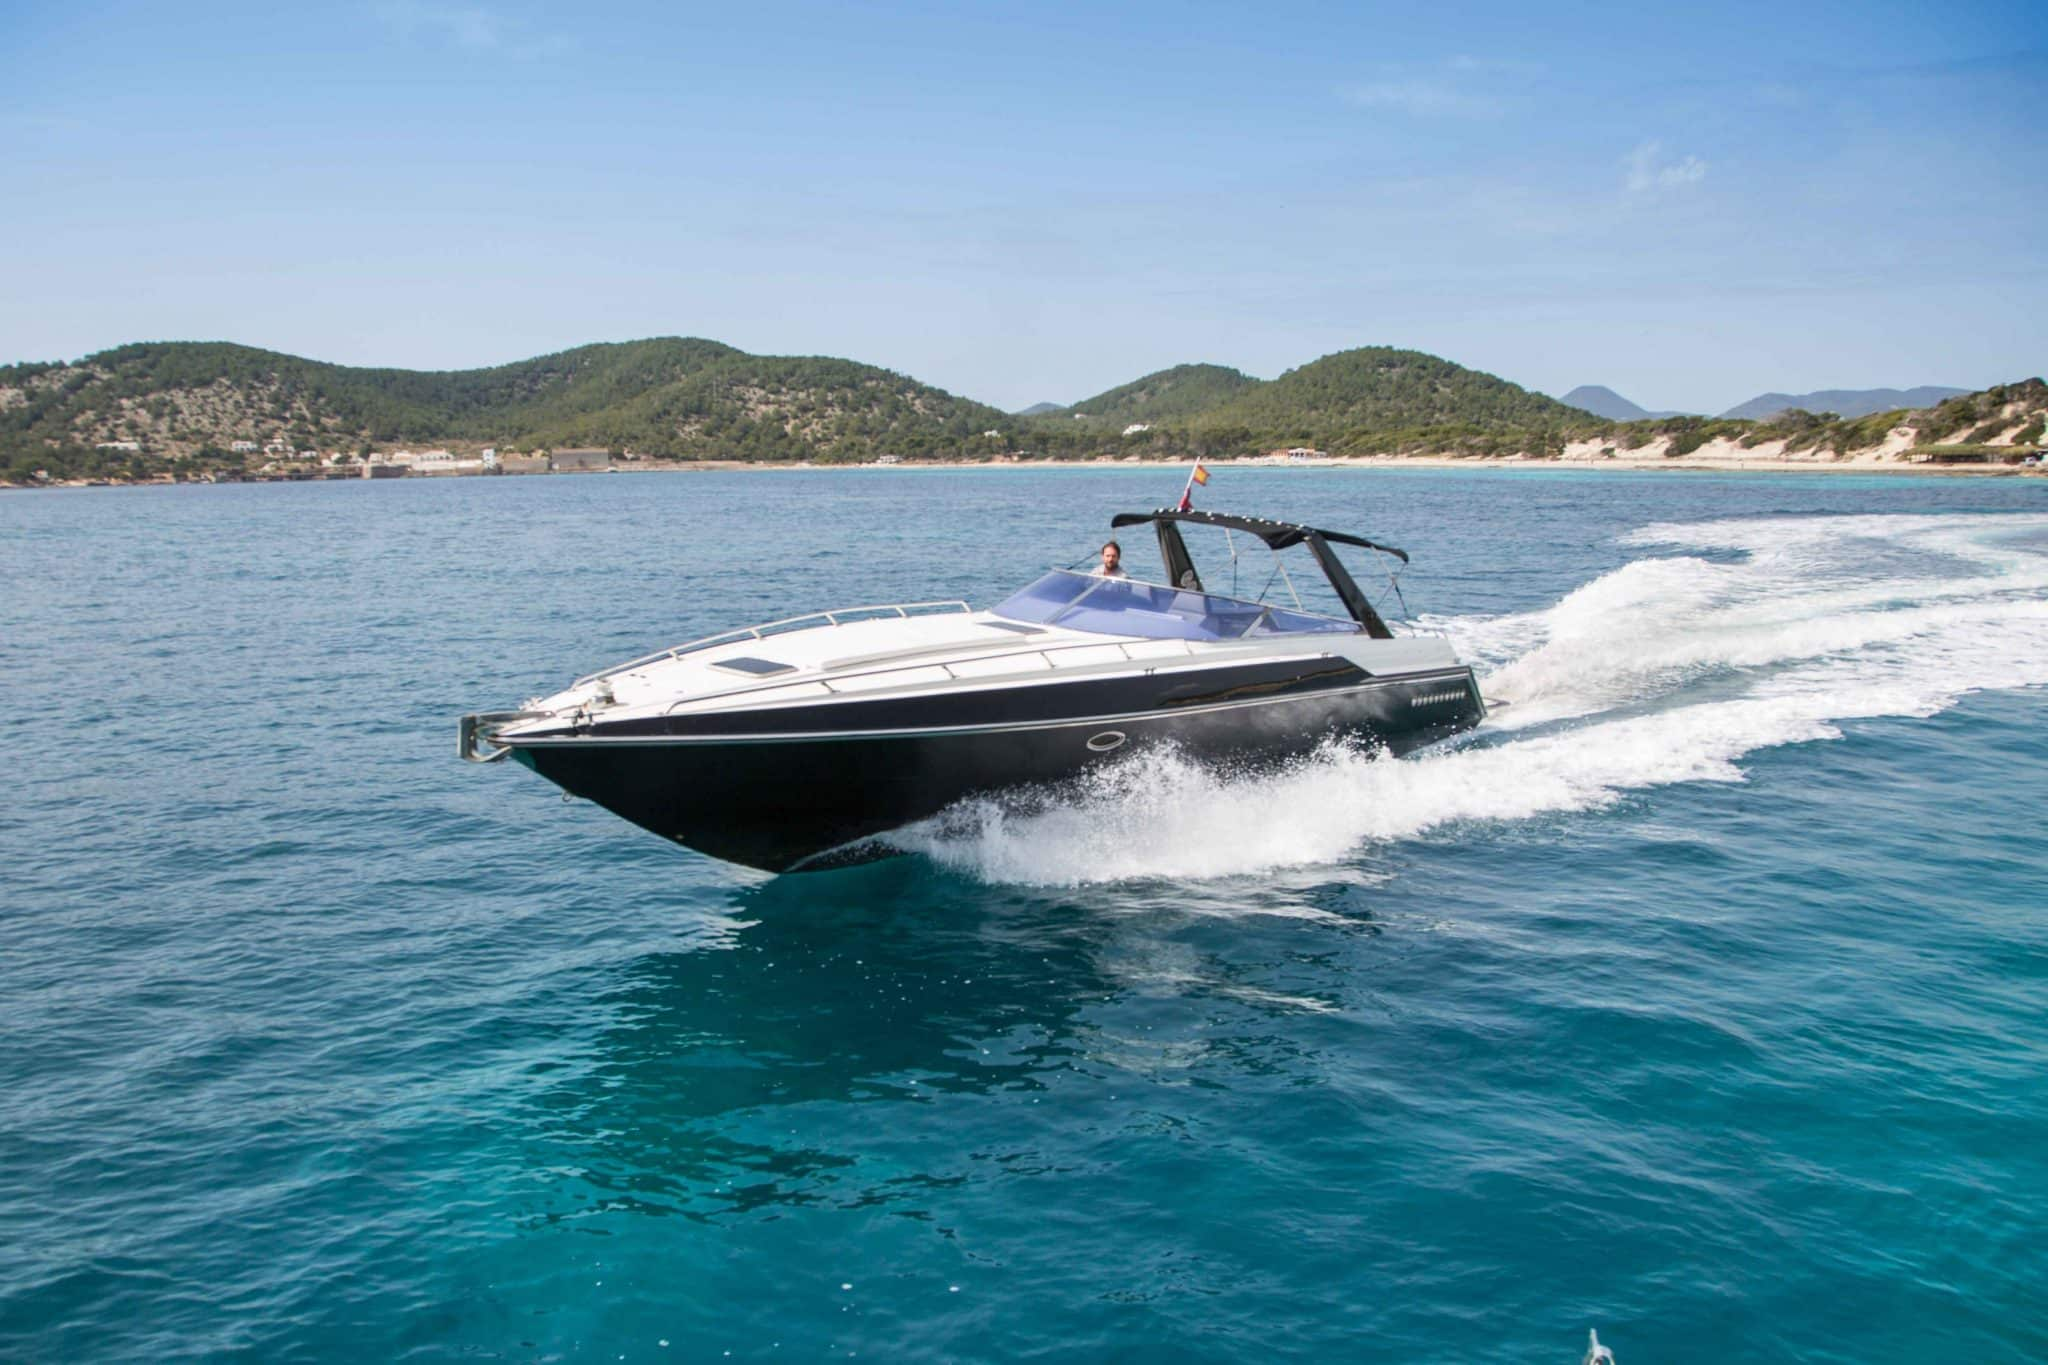 The Sunseeker Thunderhawk cruising in the bay of salinas